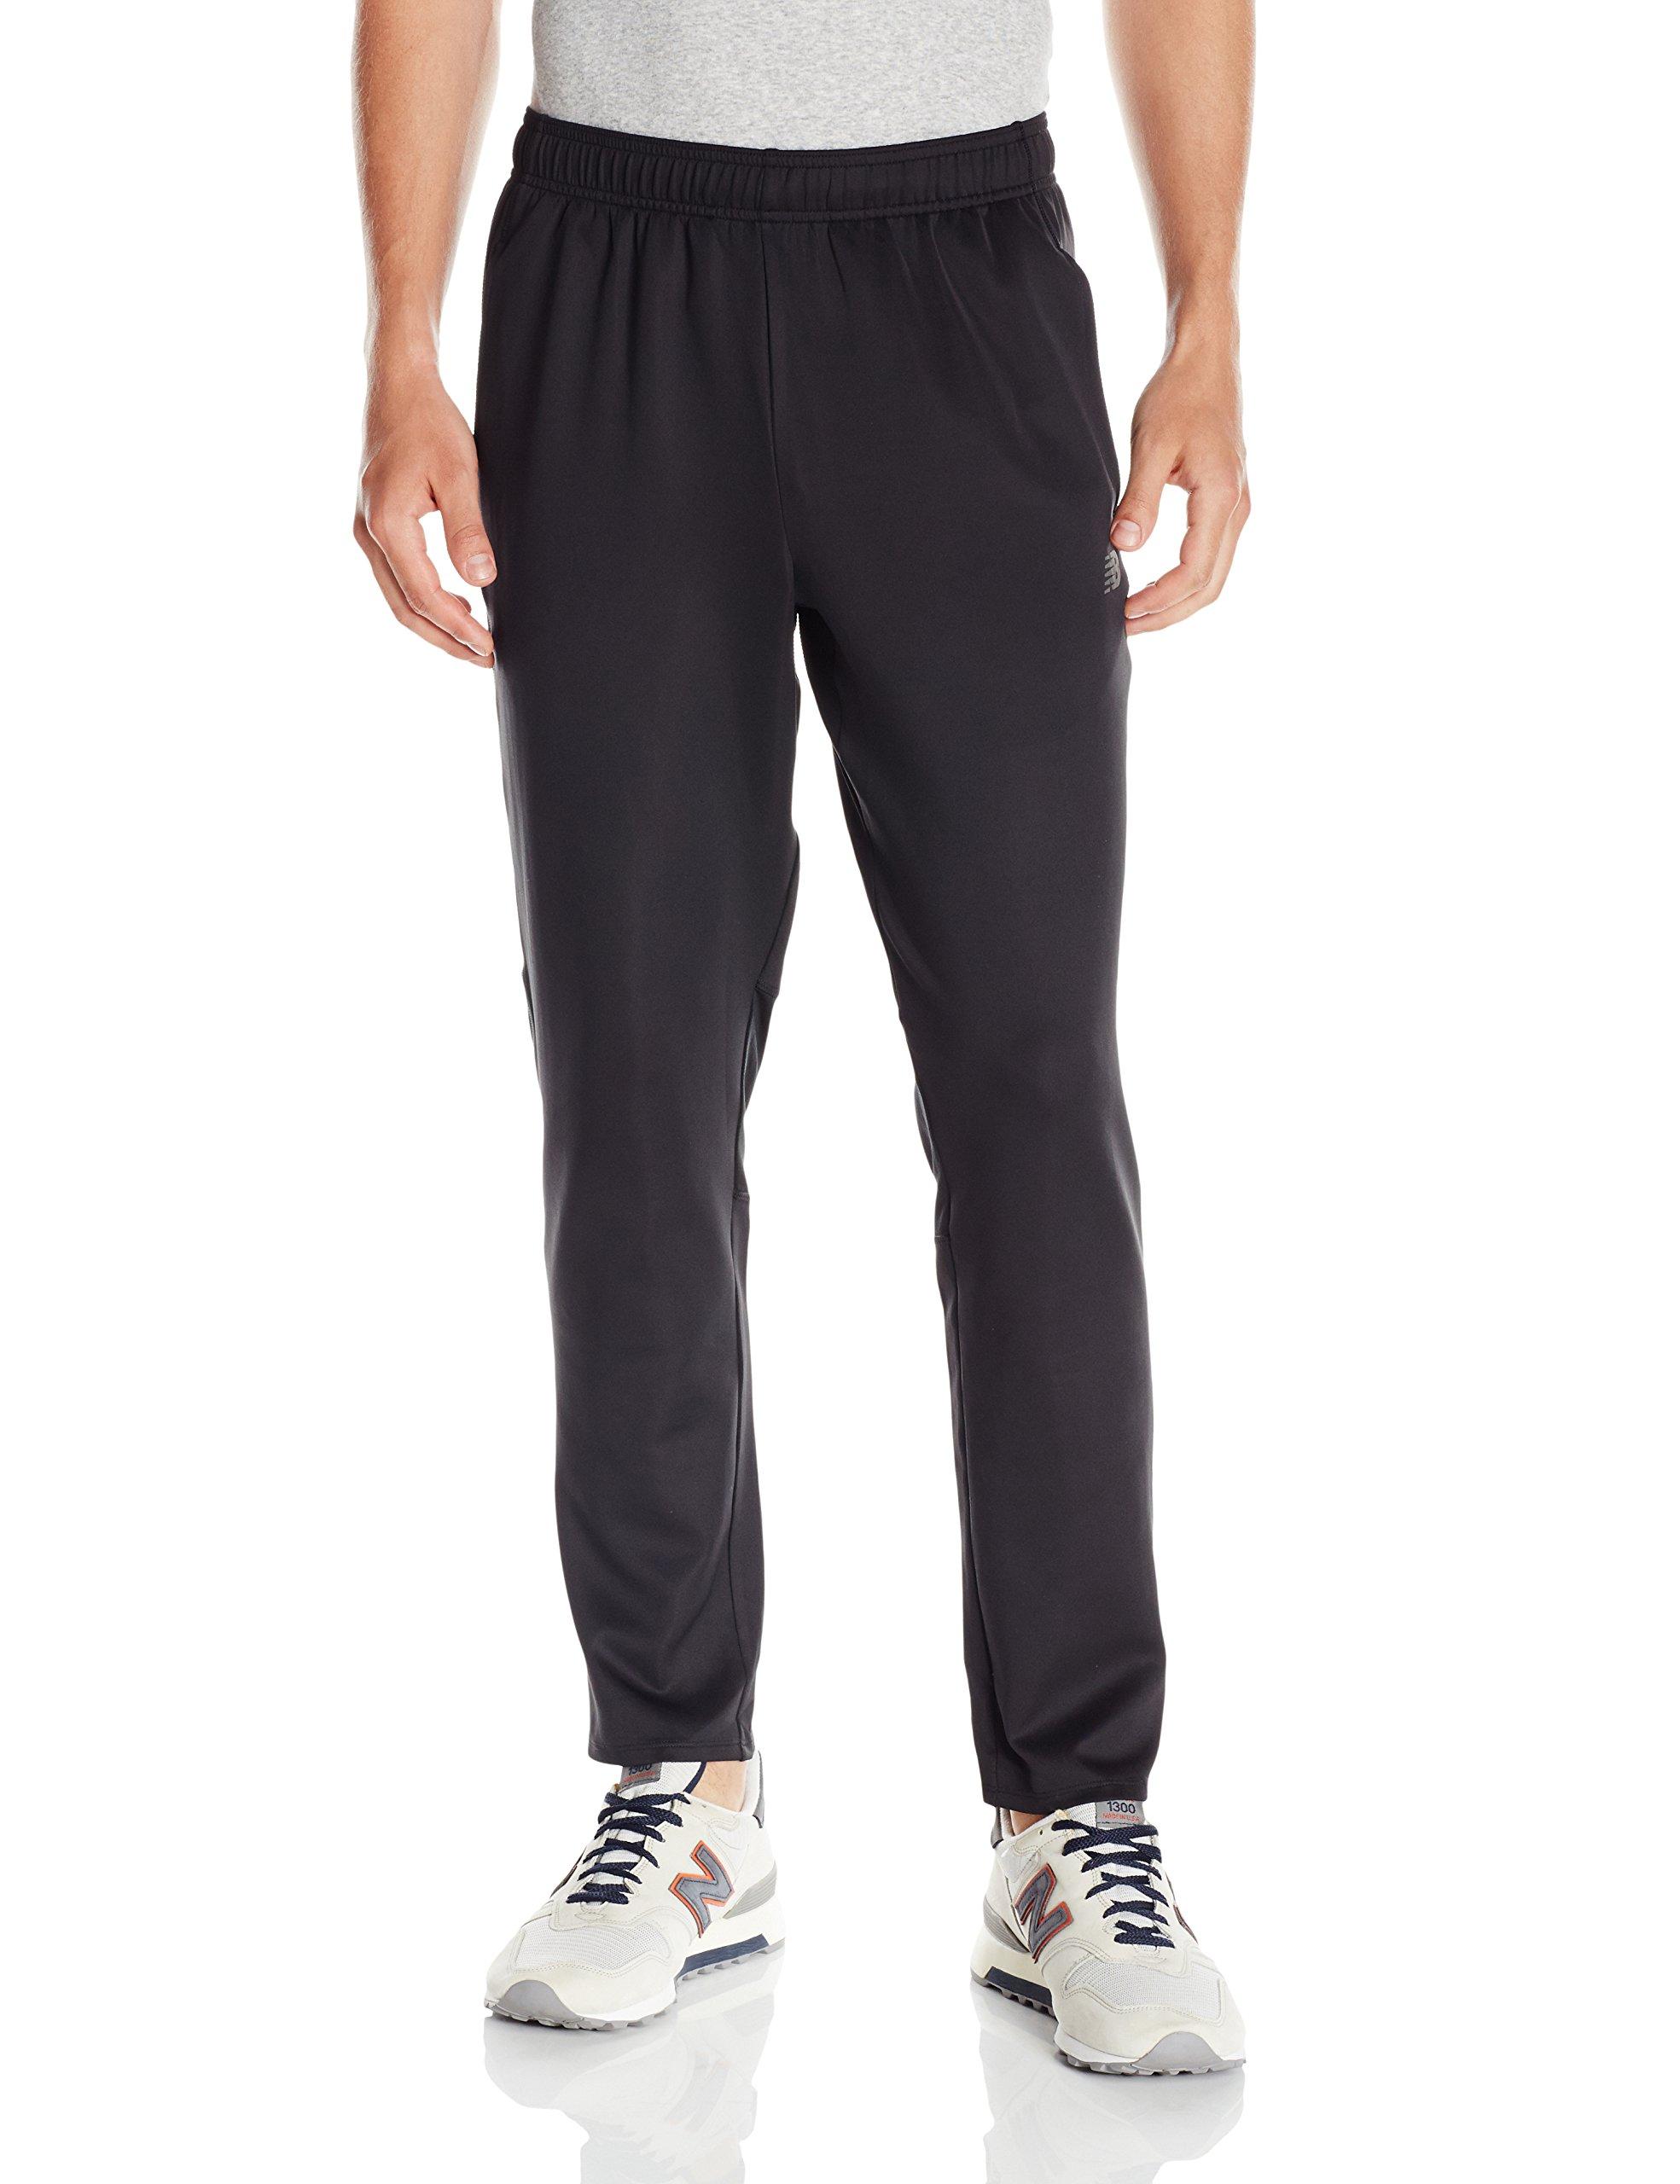 New Balance Mens Gazelle Pant, black, Small